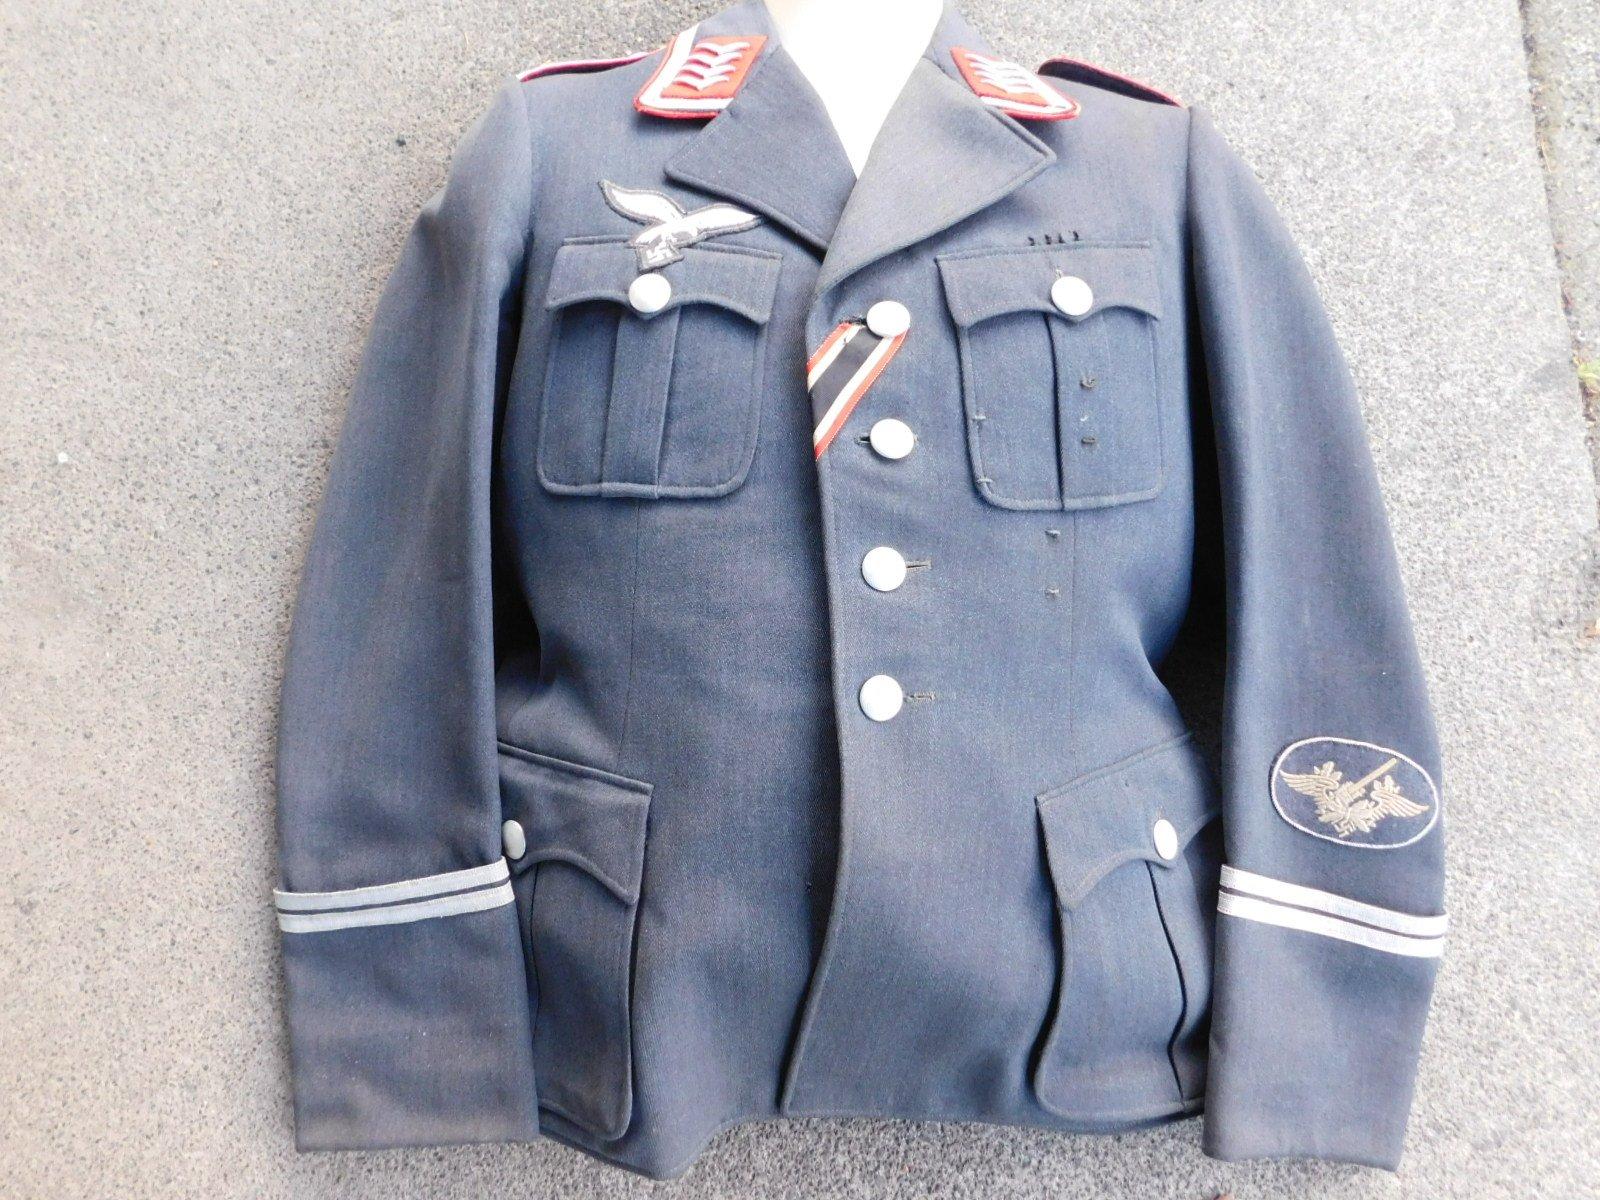 [CDA] Le Caillou- Luftwaffe, hiver 44/45 - Page 4 DSCN4655